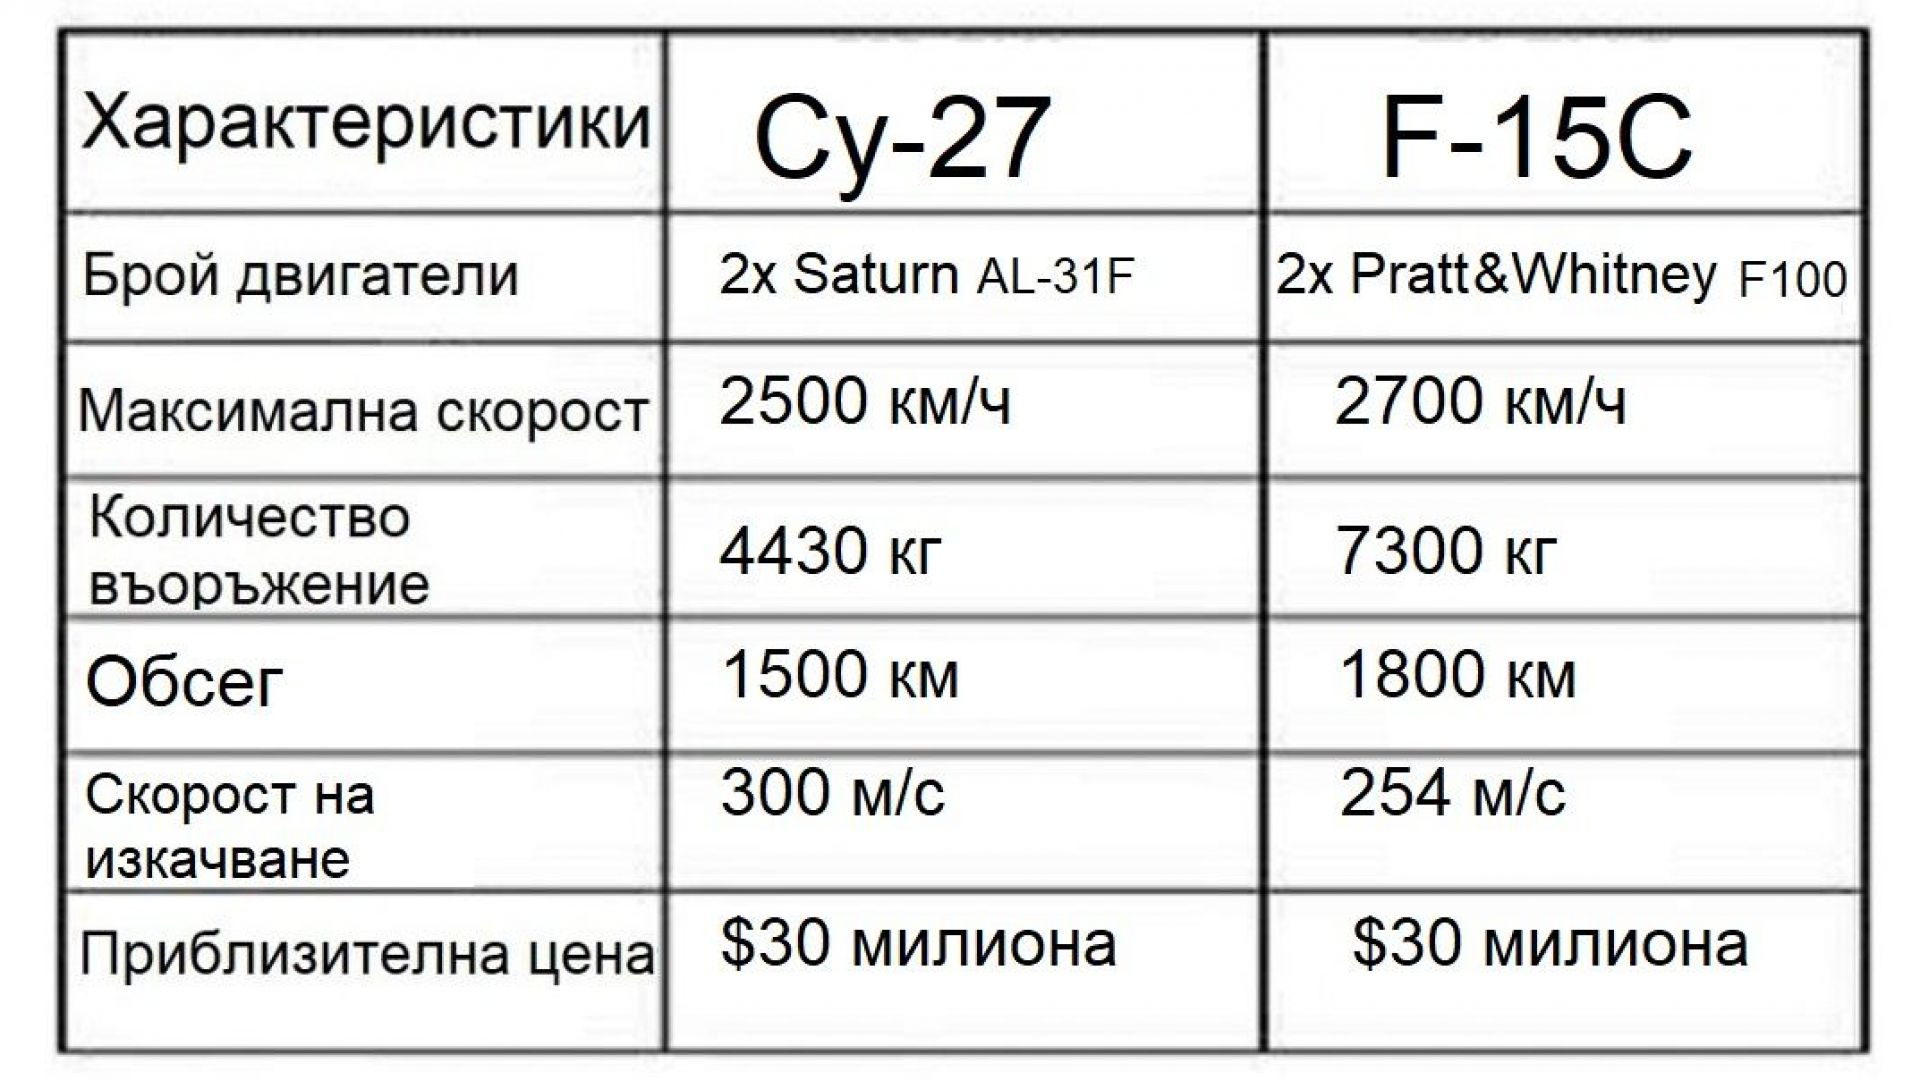 Сравнение между Су-27 и F-15C